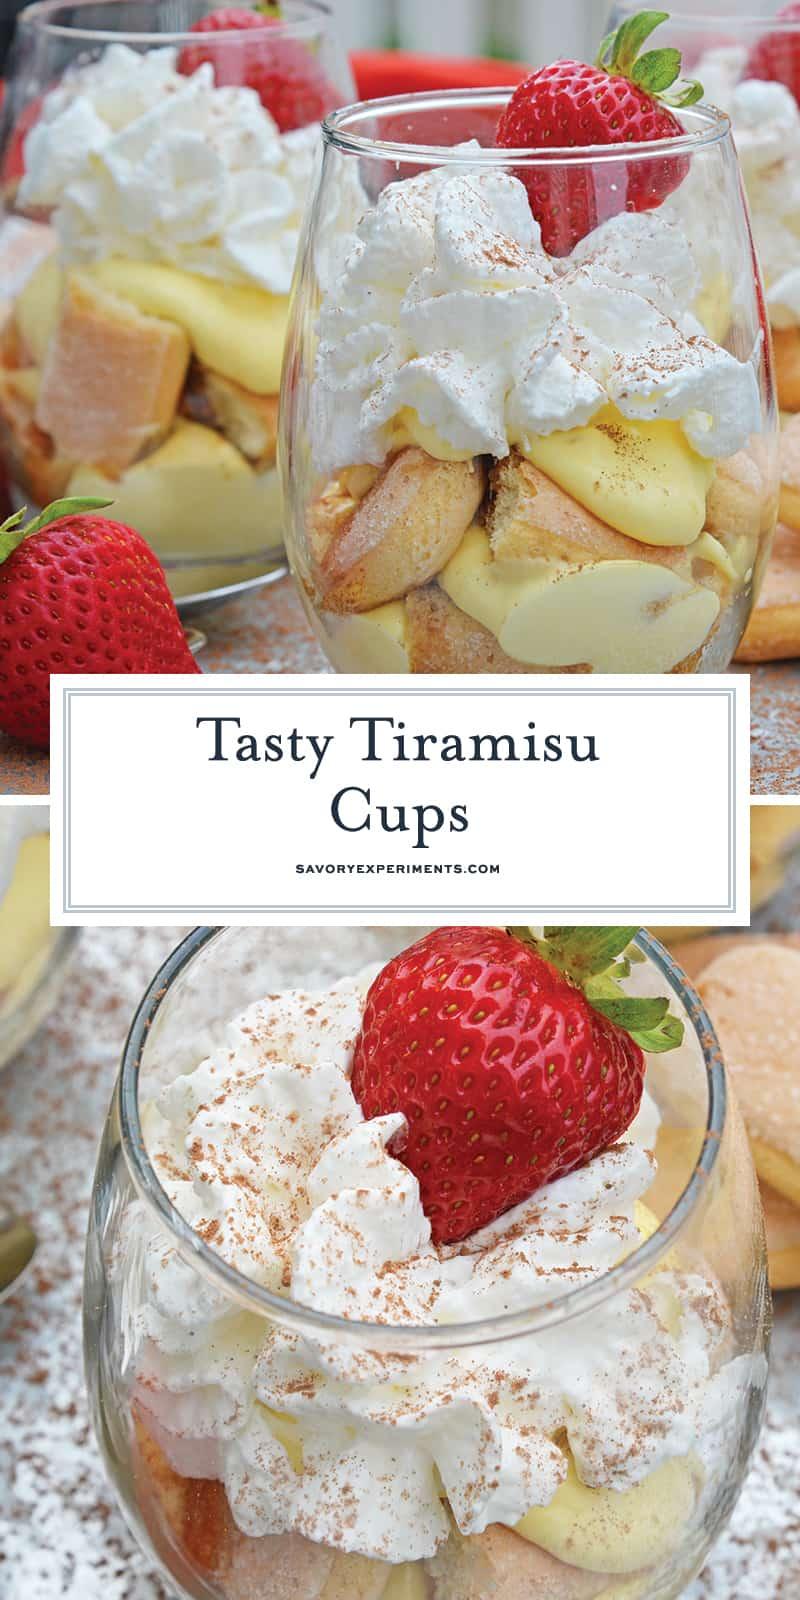 Tiramisu Cups are an easy, make-ahead dessert recipes layering mascarpone custard with espresso soaked lady finger cookies and whipped cream. #easytiramisurecipe #tiramisucups www.savoryexperiments.com